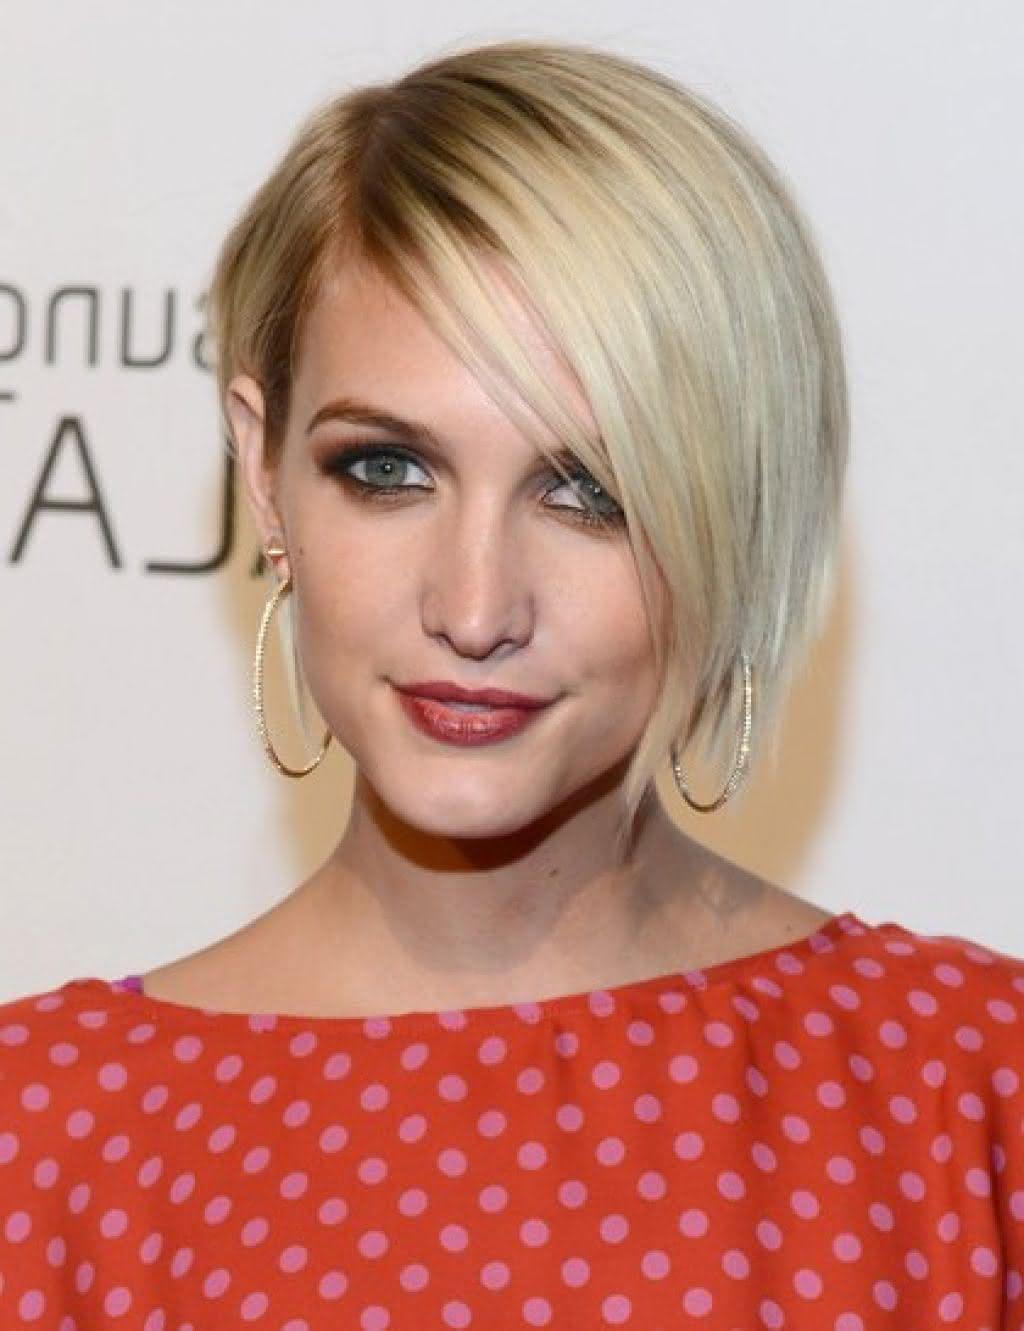 short-blonde-bob-hairstyles-with-side-bangs-ashlee-simpson-wentz-53f6b2ca3fa24